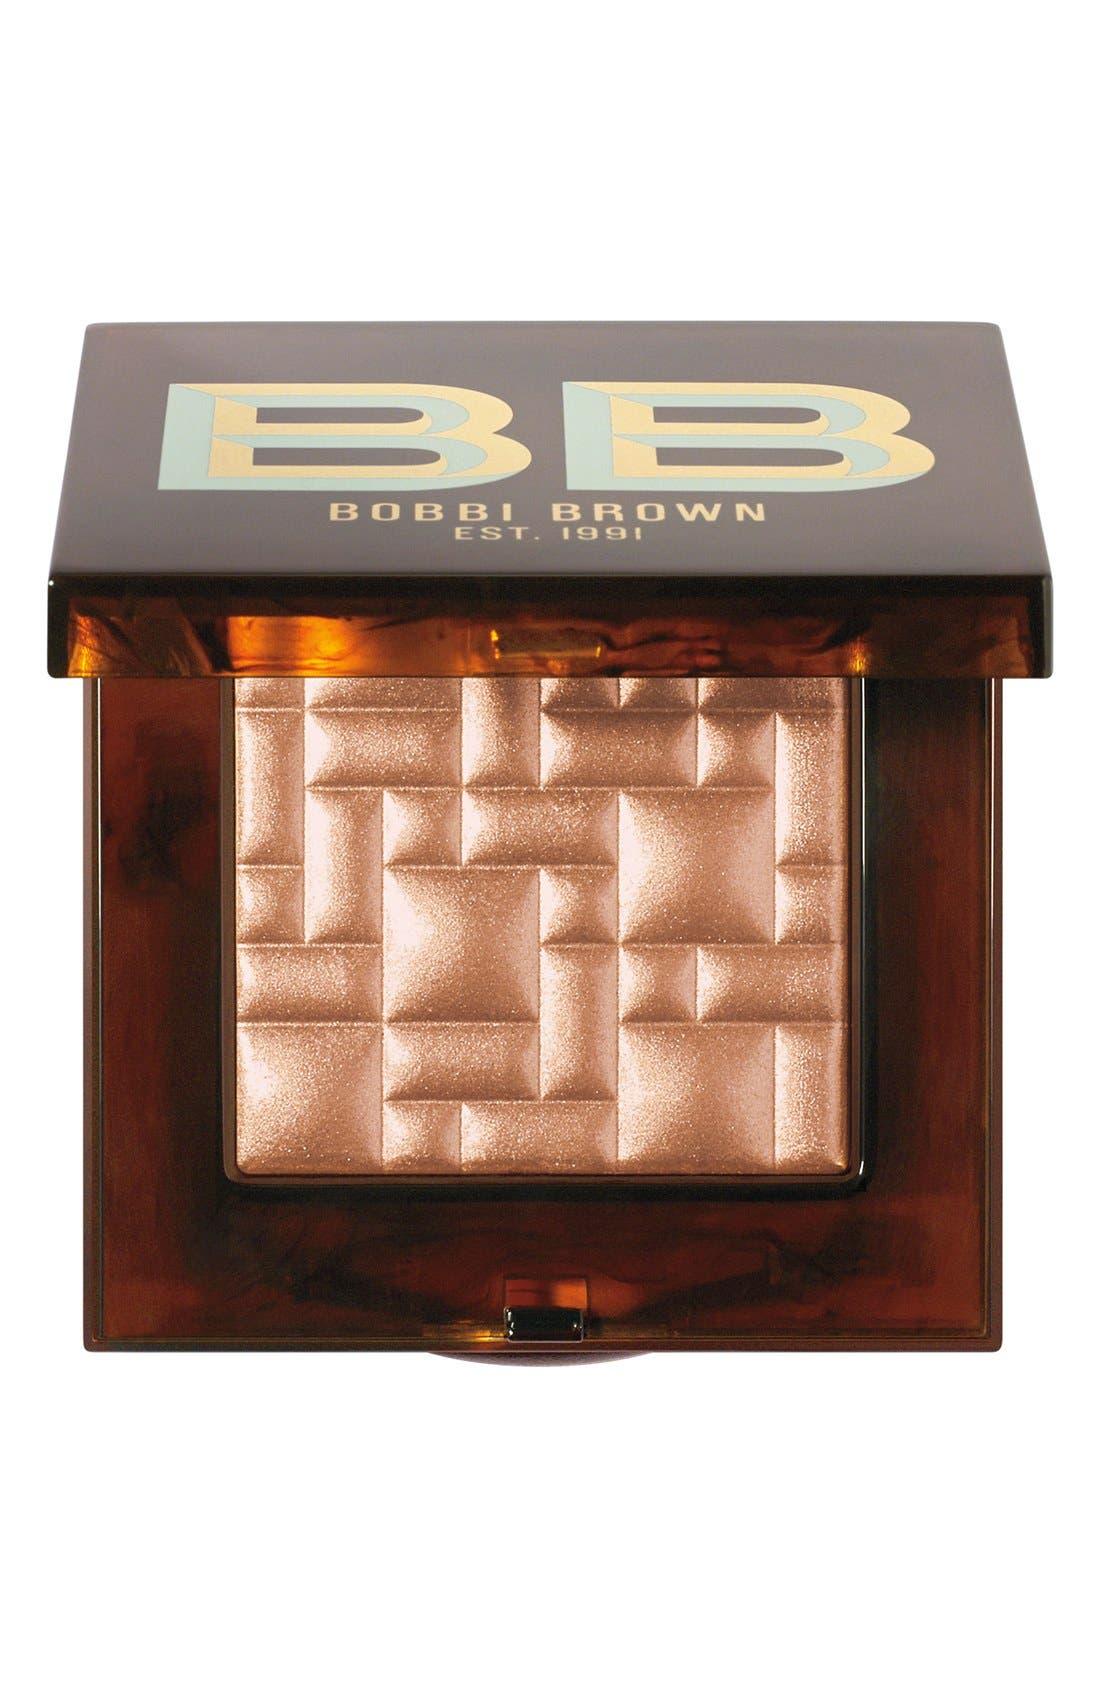 BOBBI BROWN 'Scotch on the Rocks' Highlight Powder, Main, color, 220